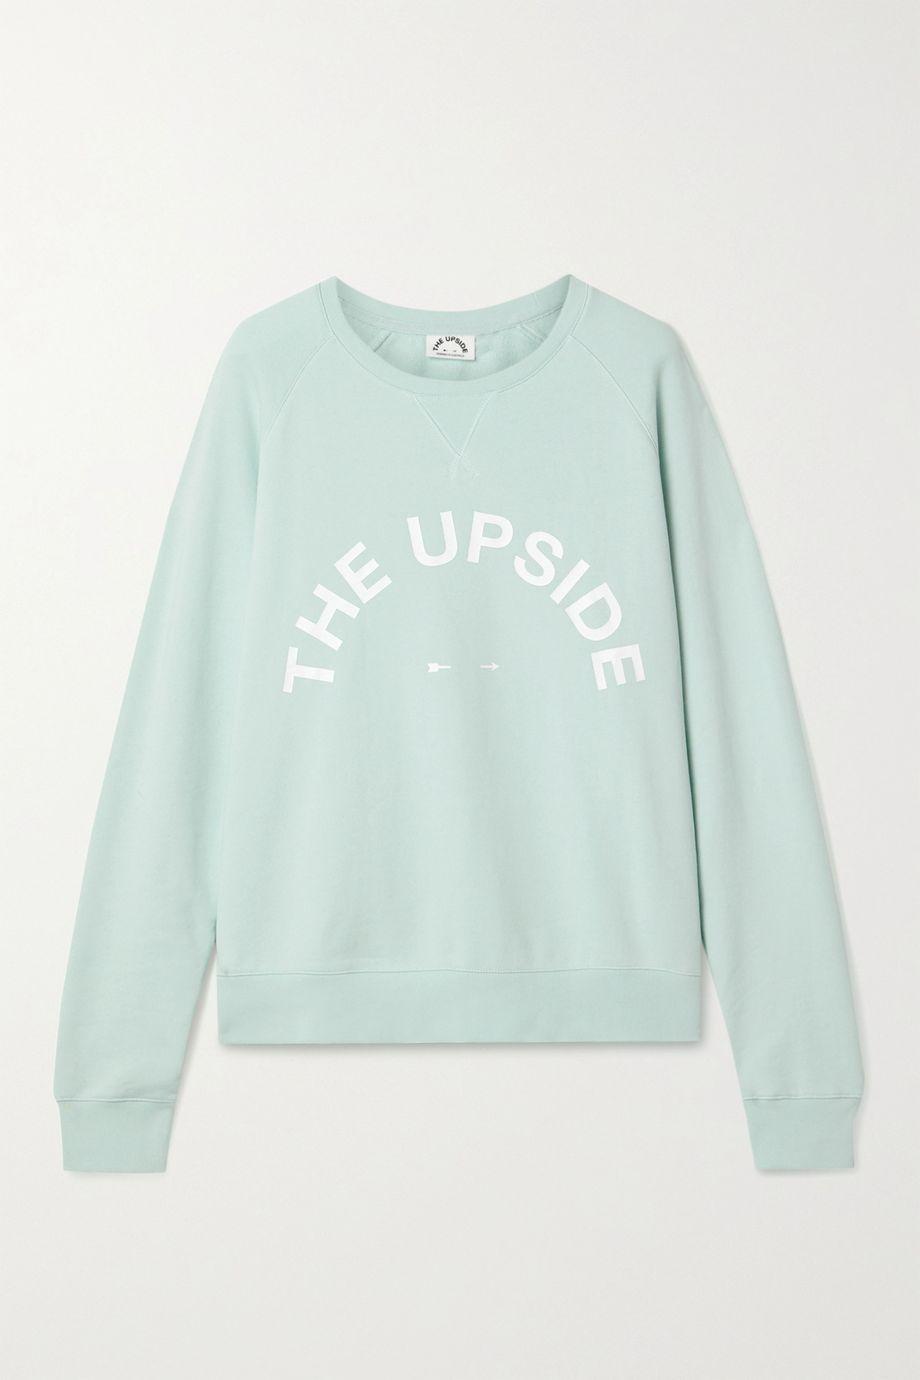 The Upside Bondi printed cotton-jersey sweatshirt